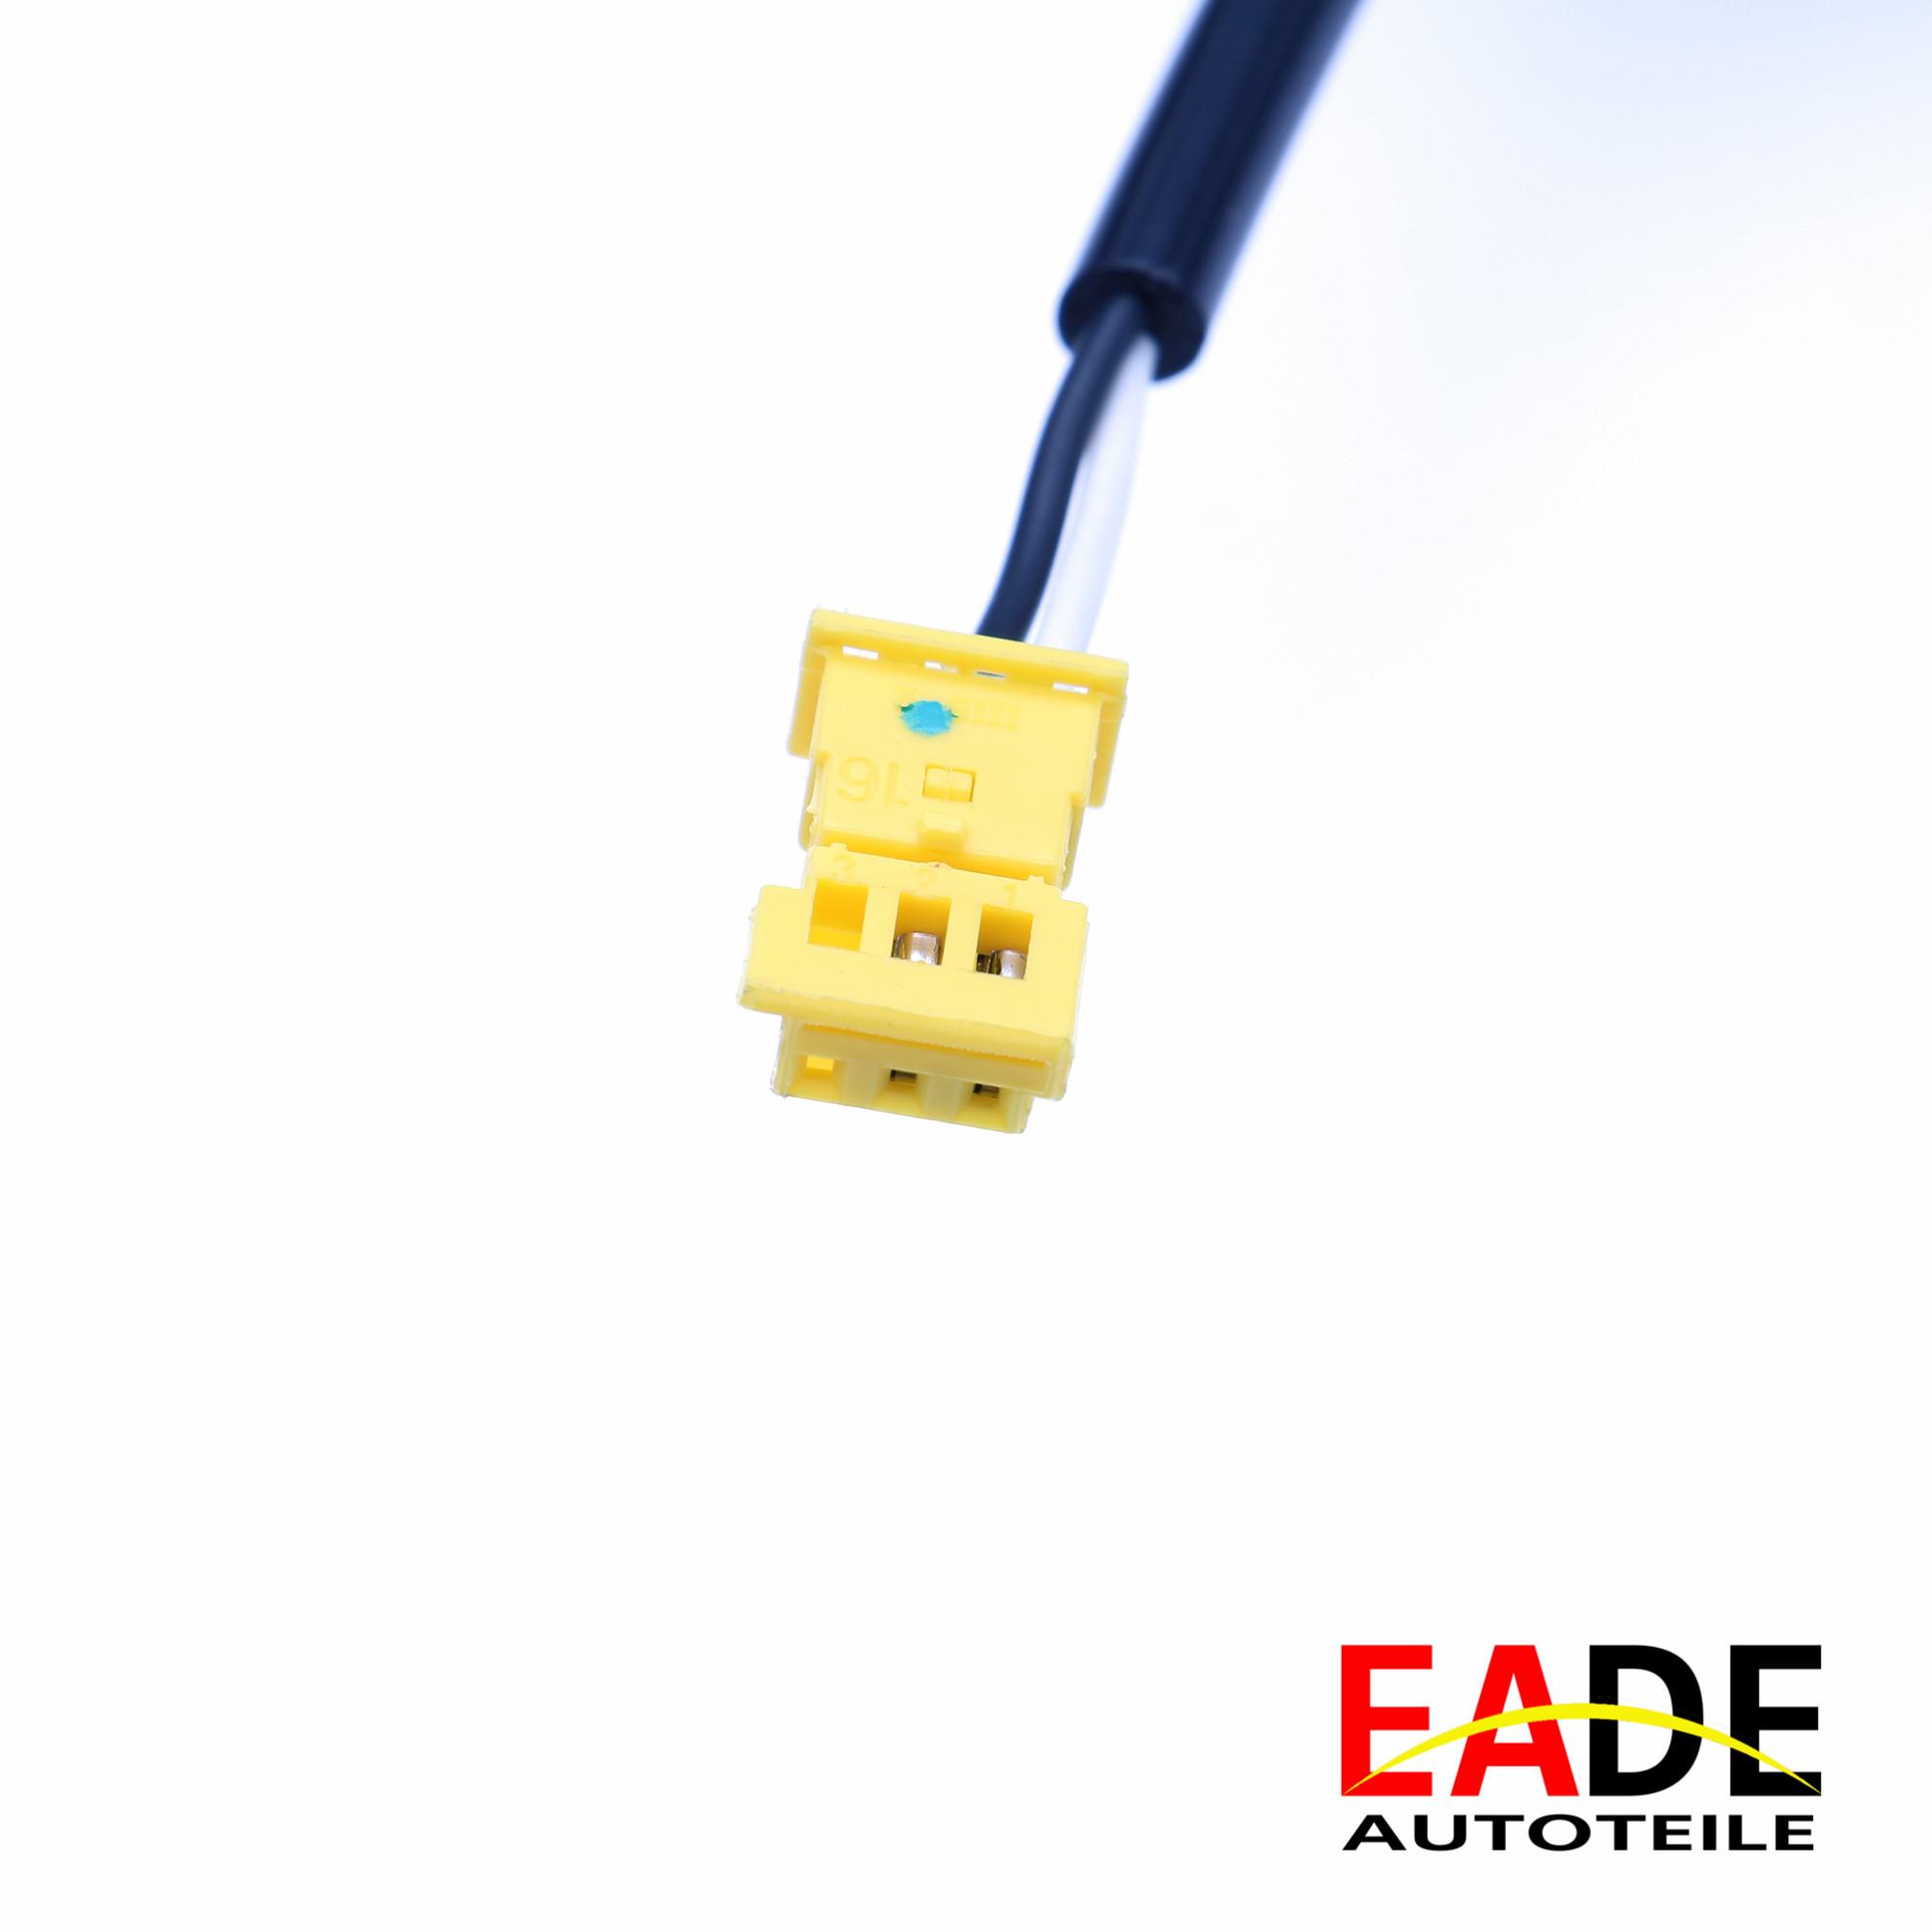 1x Premium ABS-Sensor Drehzahlfühler Raddrehzahlsensor E-Klasse hinten links